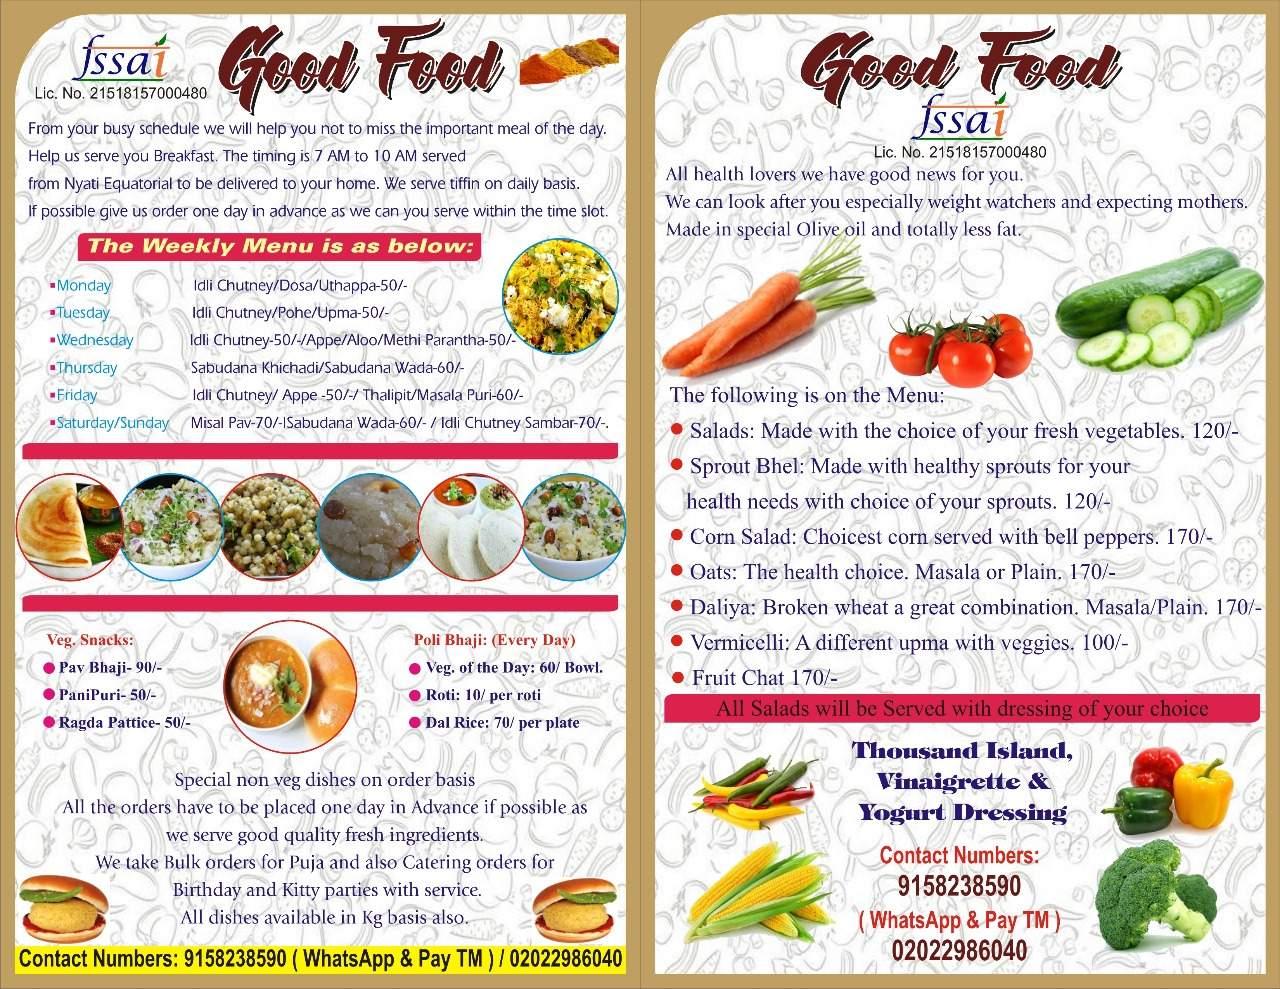 Top 10 Tiffin Services in Bavdhan, Pune - Best Home Food